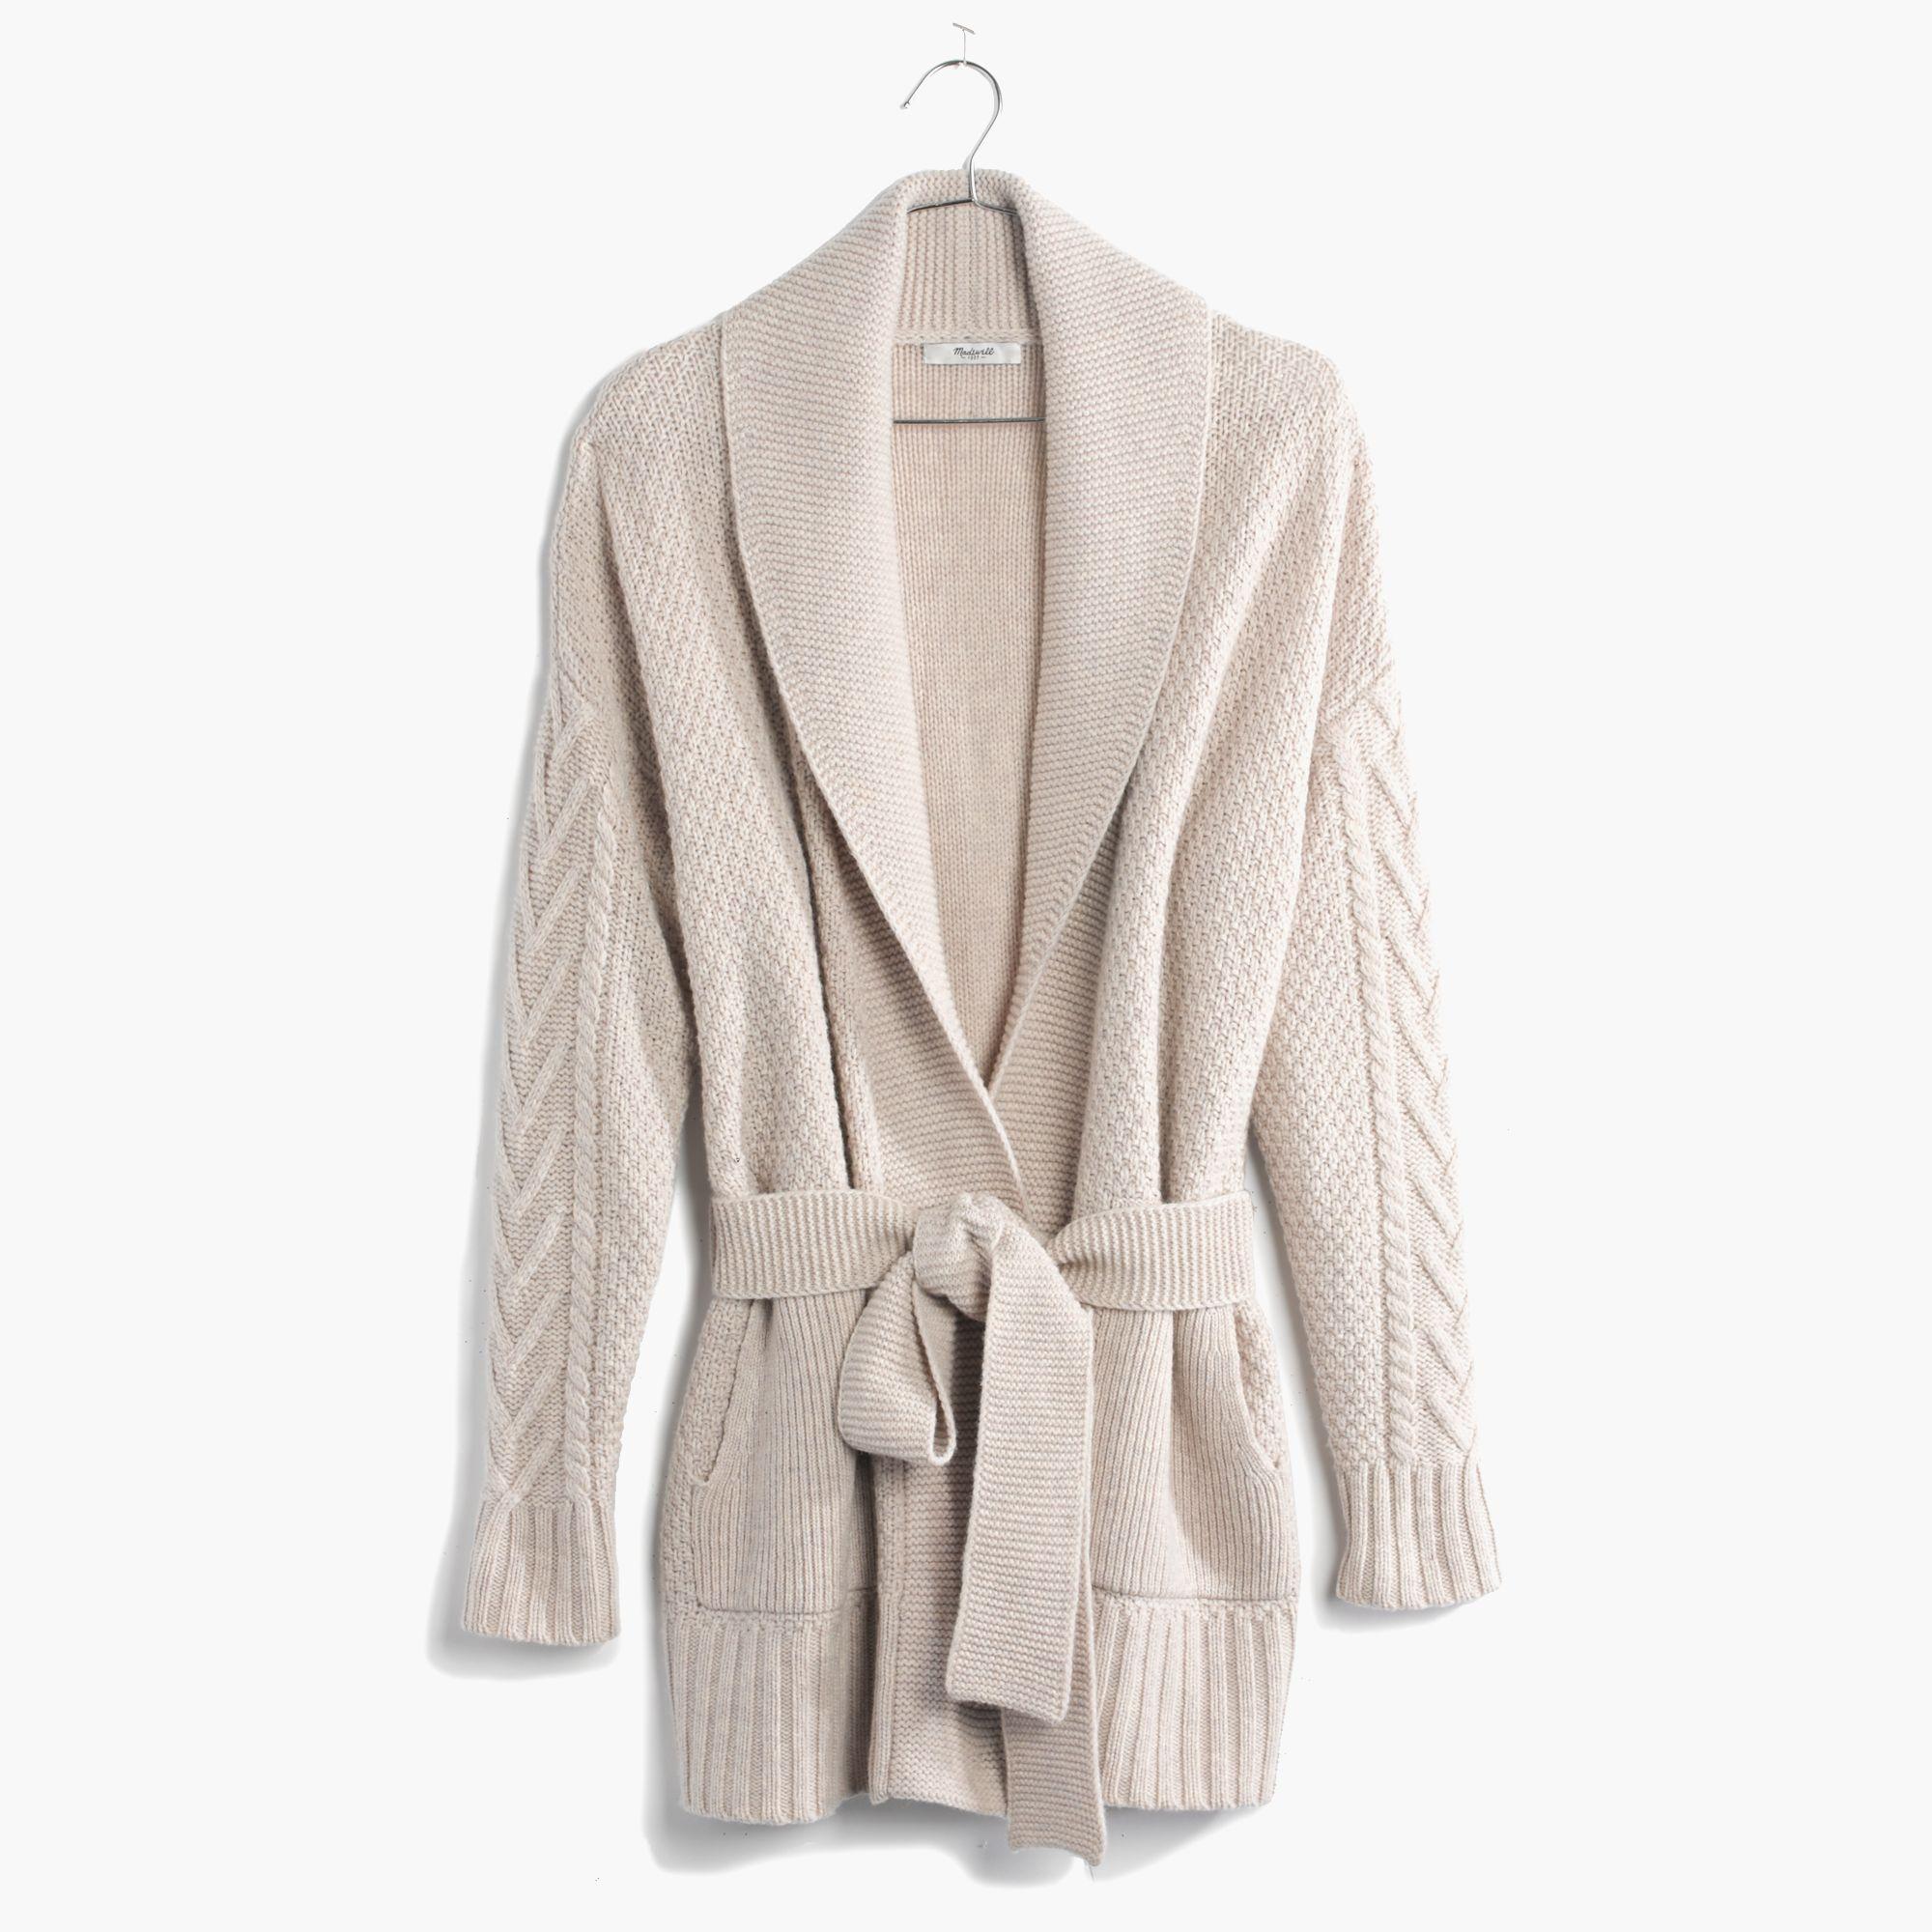 Madewell Shawl-Collar Wrap Cardigan Sweater in Natural | Lyst